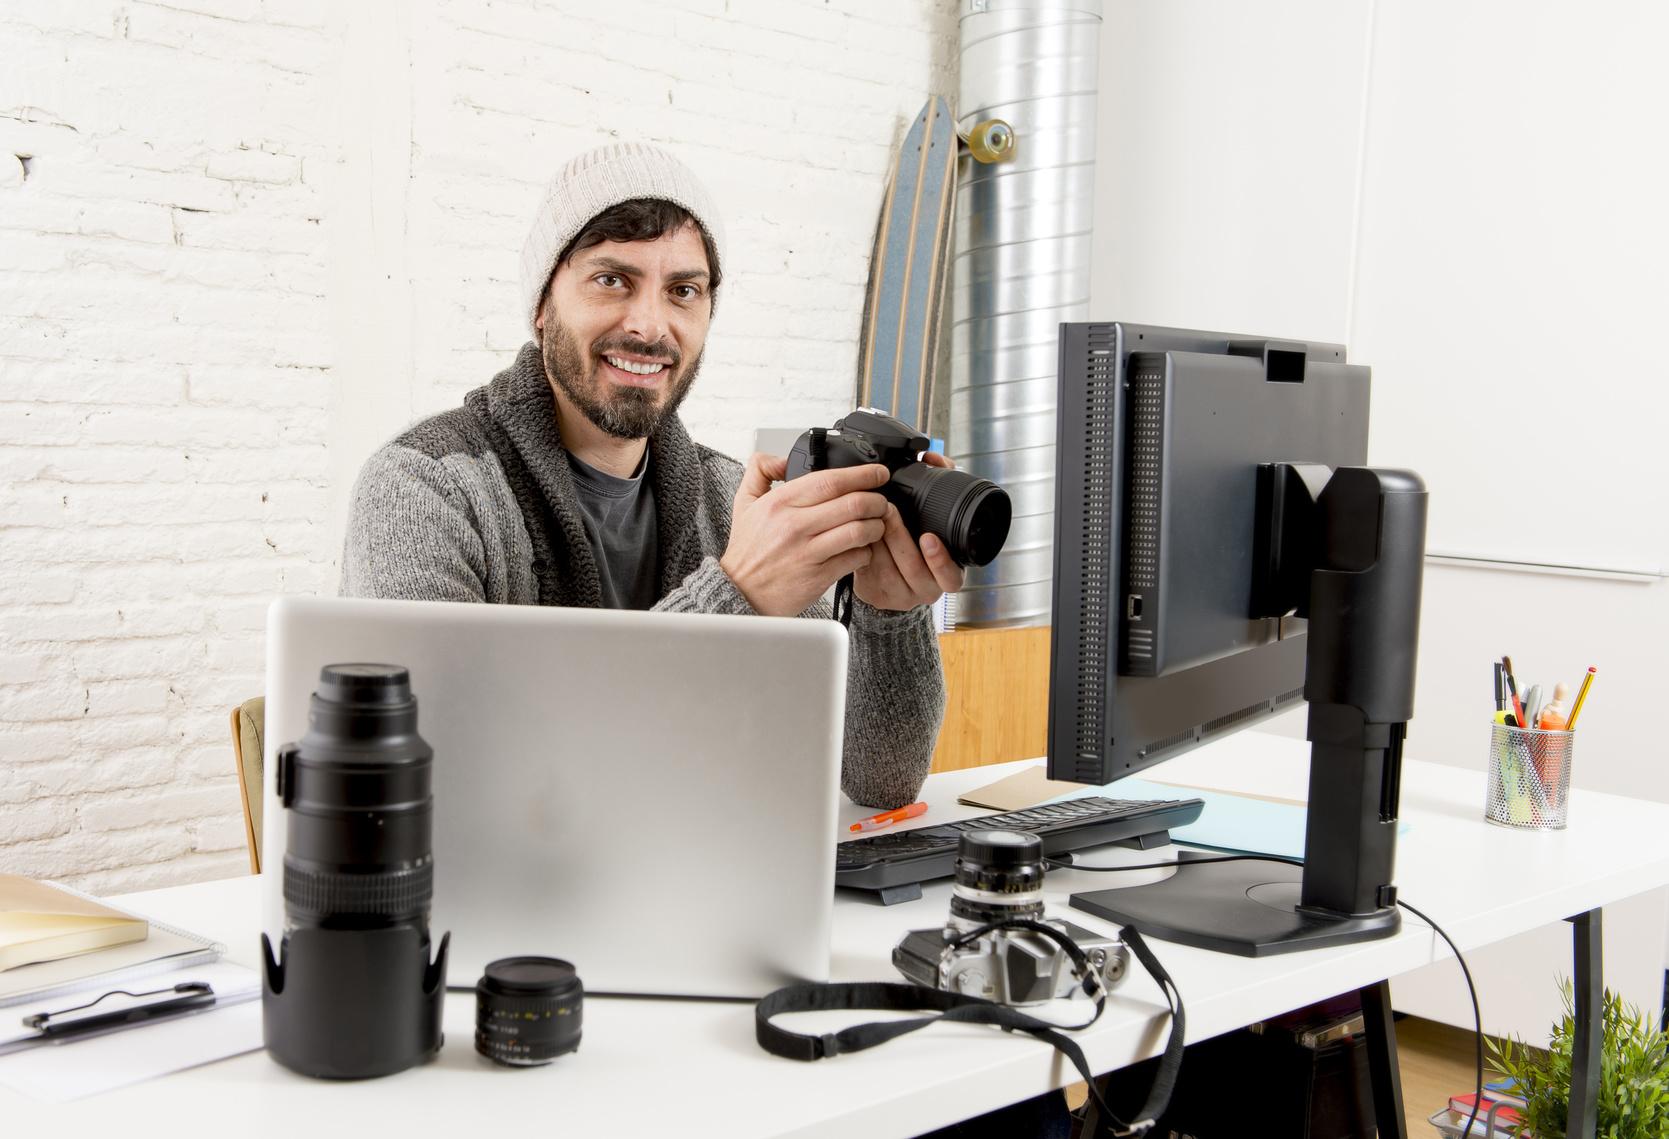 Fotograf Ausbildung Gehalt Studium Perspektive  Heimarbeitde